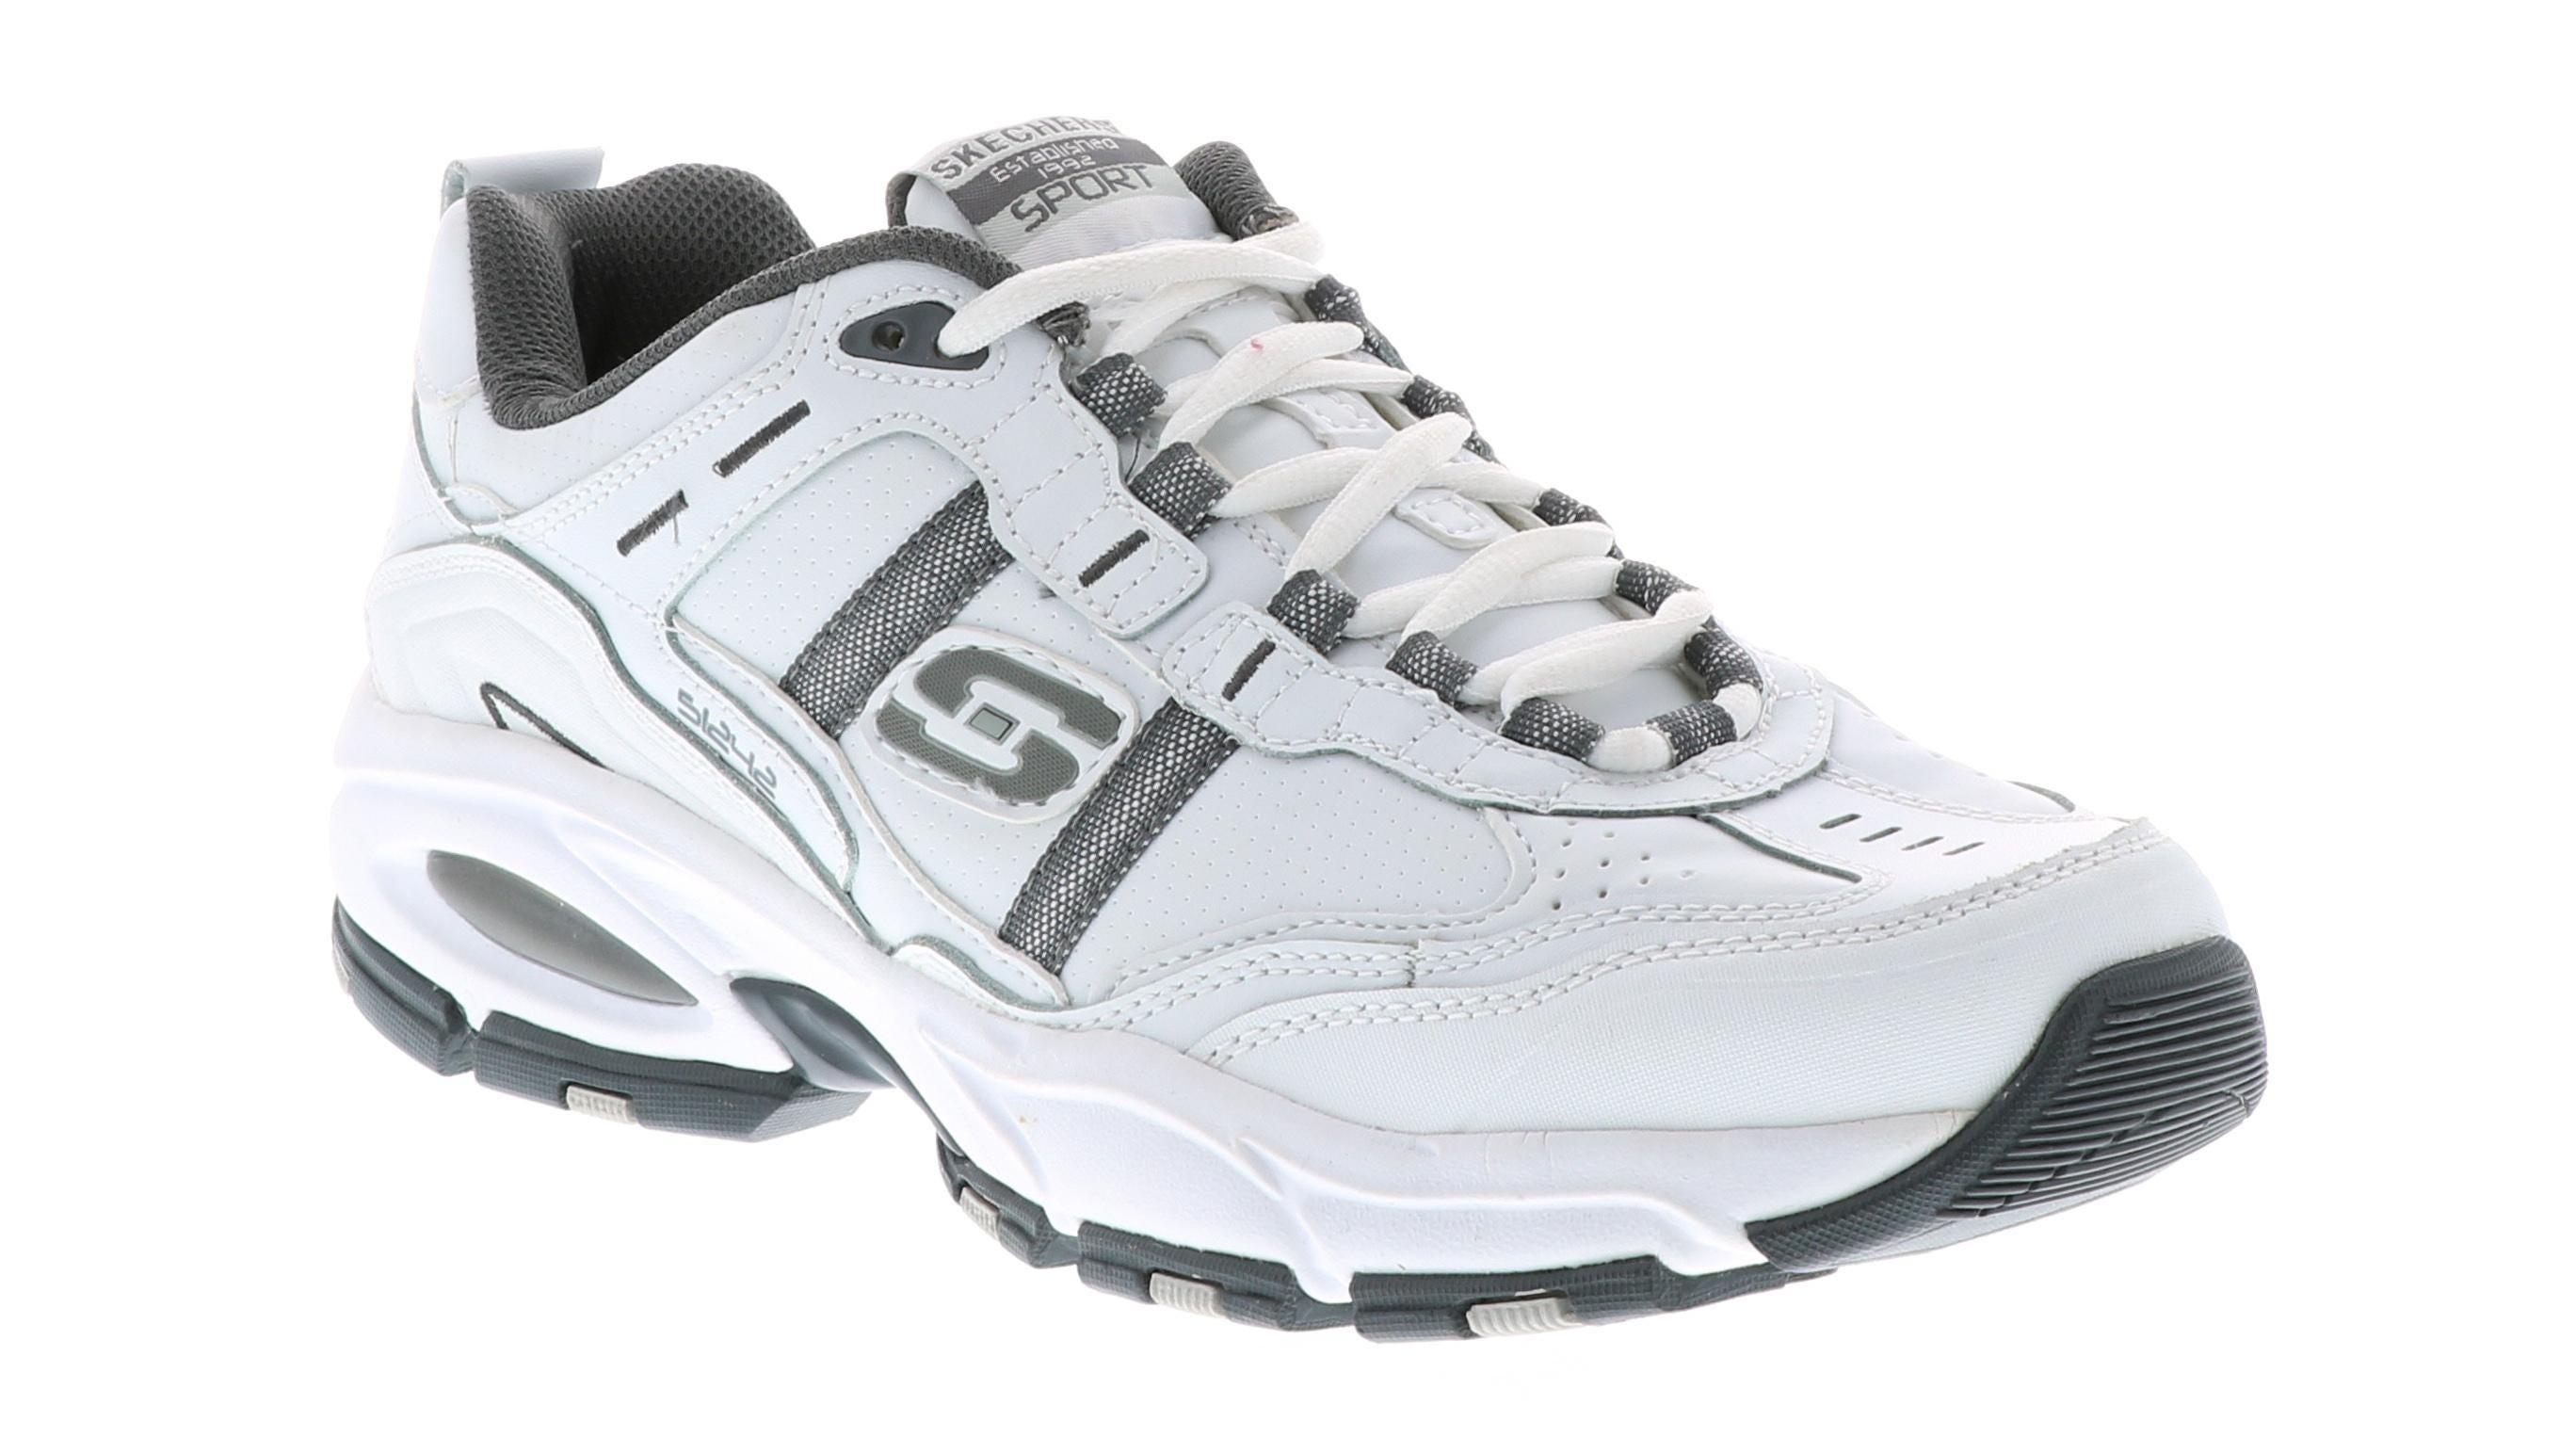 skechers mens white shoes